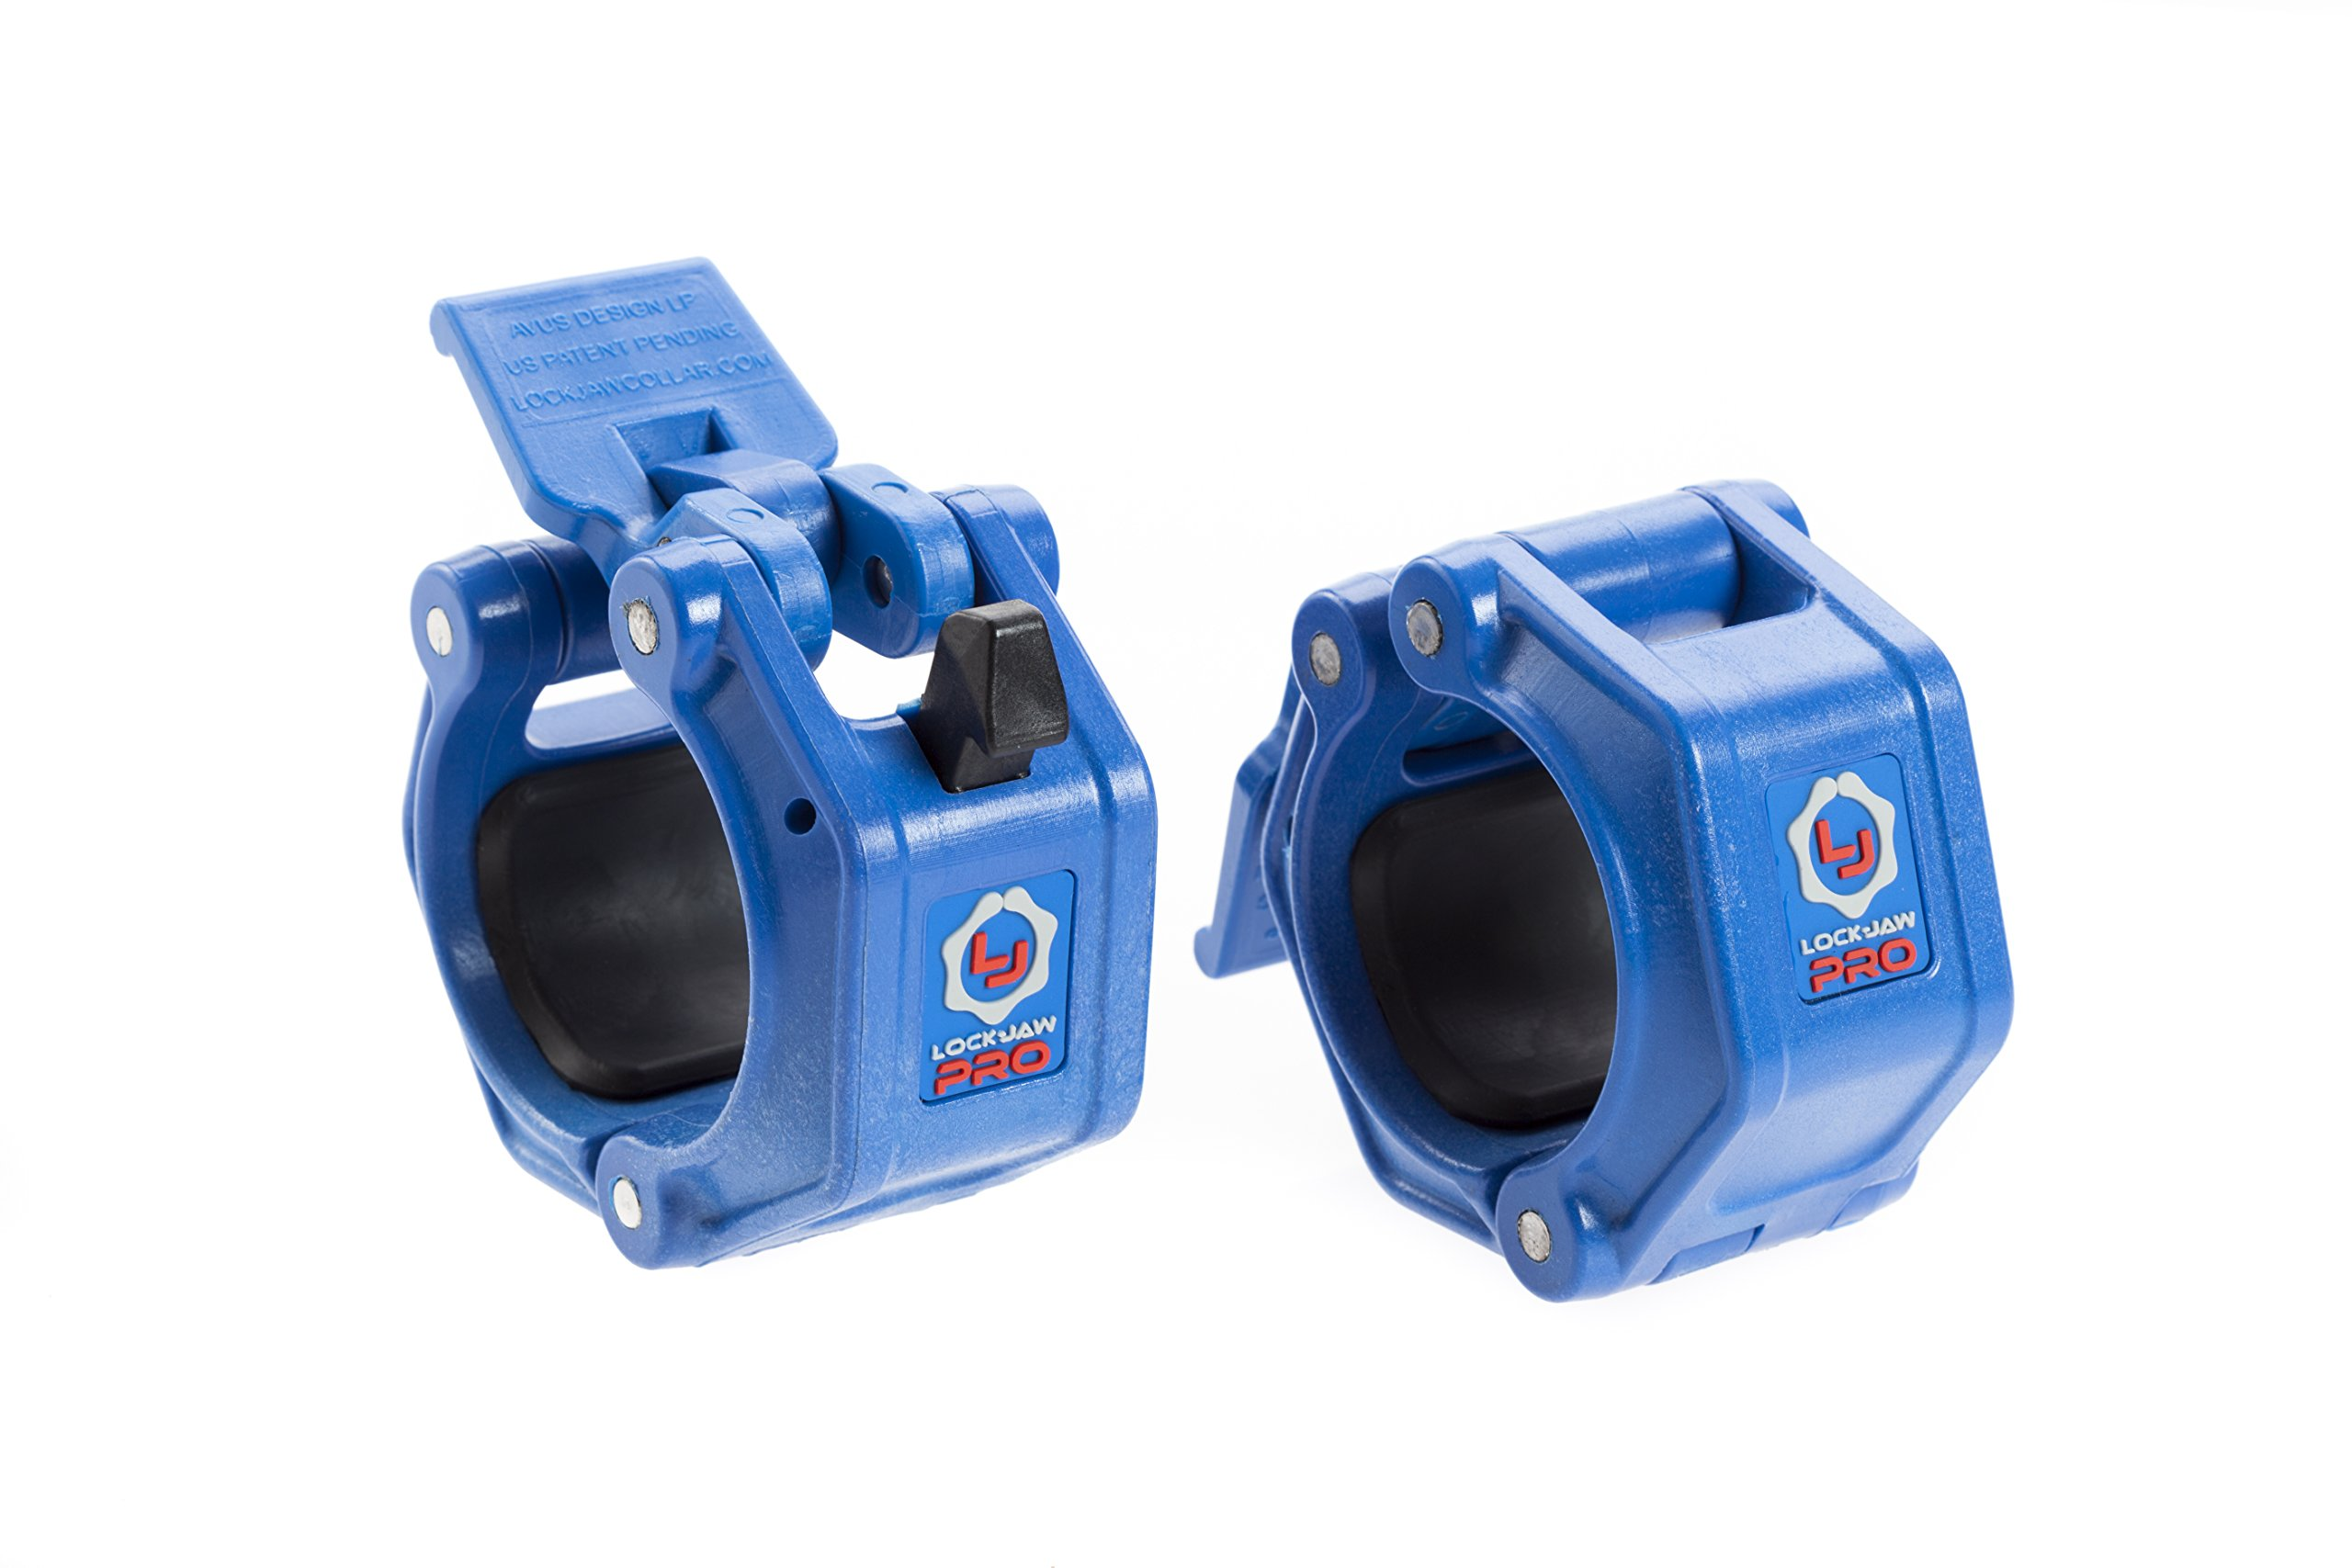 Lock-Jaw PRO 2 Barbell Collar (2'' / 50mm) (Blue)